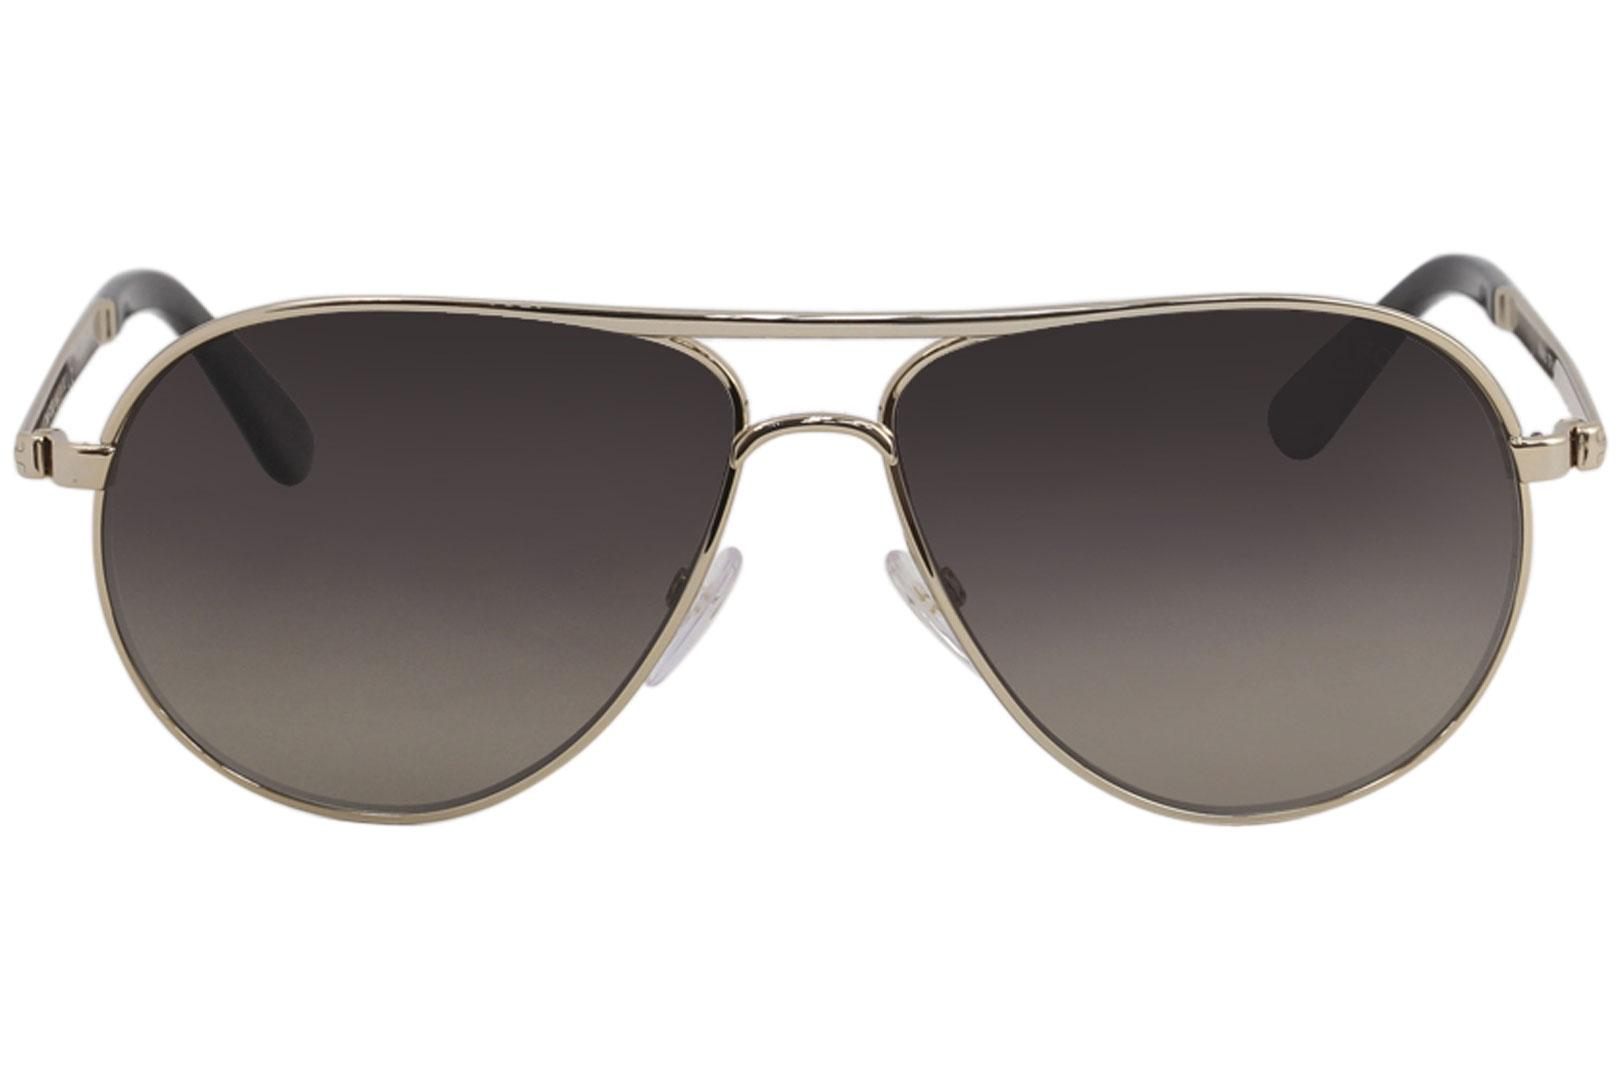 0c7a1eca5e5 ... Marko TF144 TF 144 Fashion Pilot Sunglasses by Tom Ford. 12345. 12345.  Color  Shiny Rose Gold Polarized Smoke - 28D